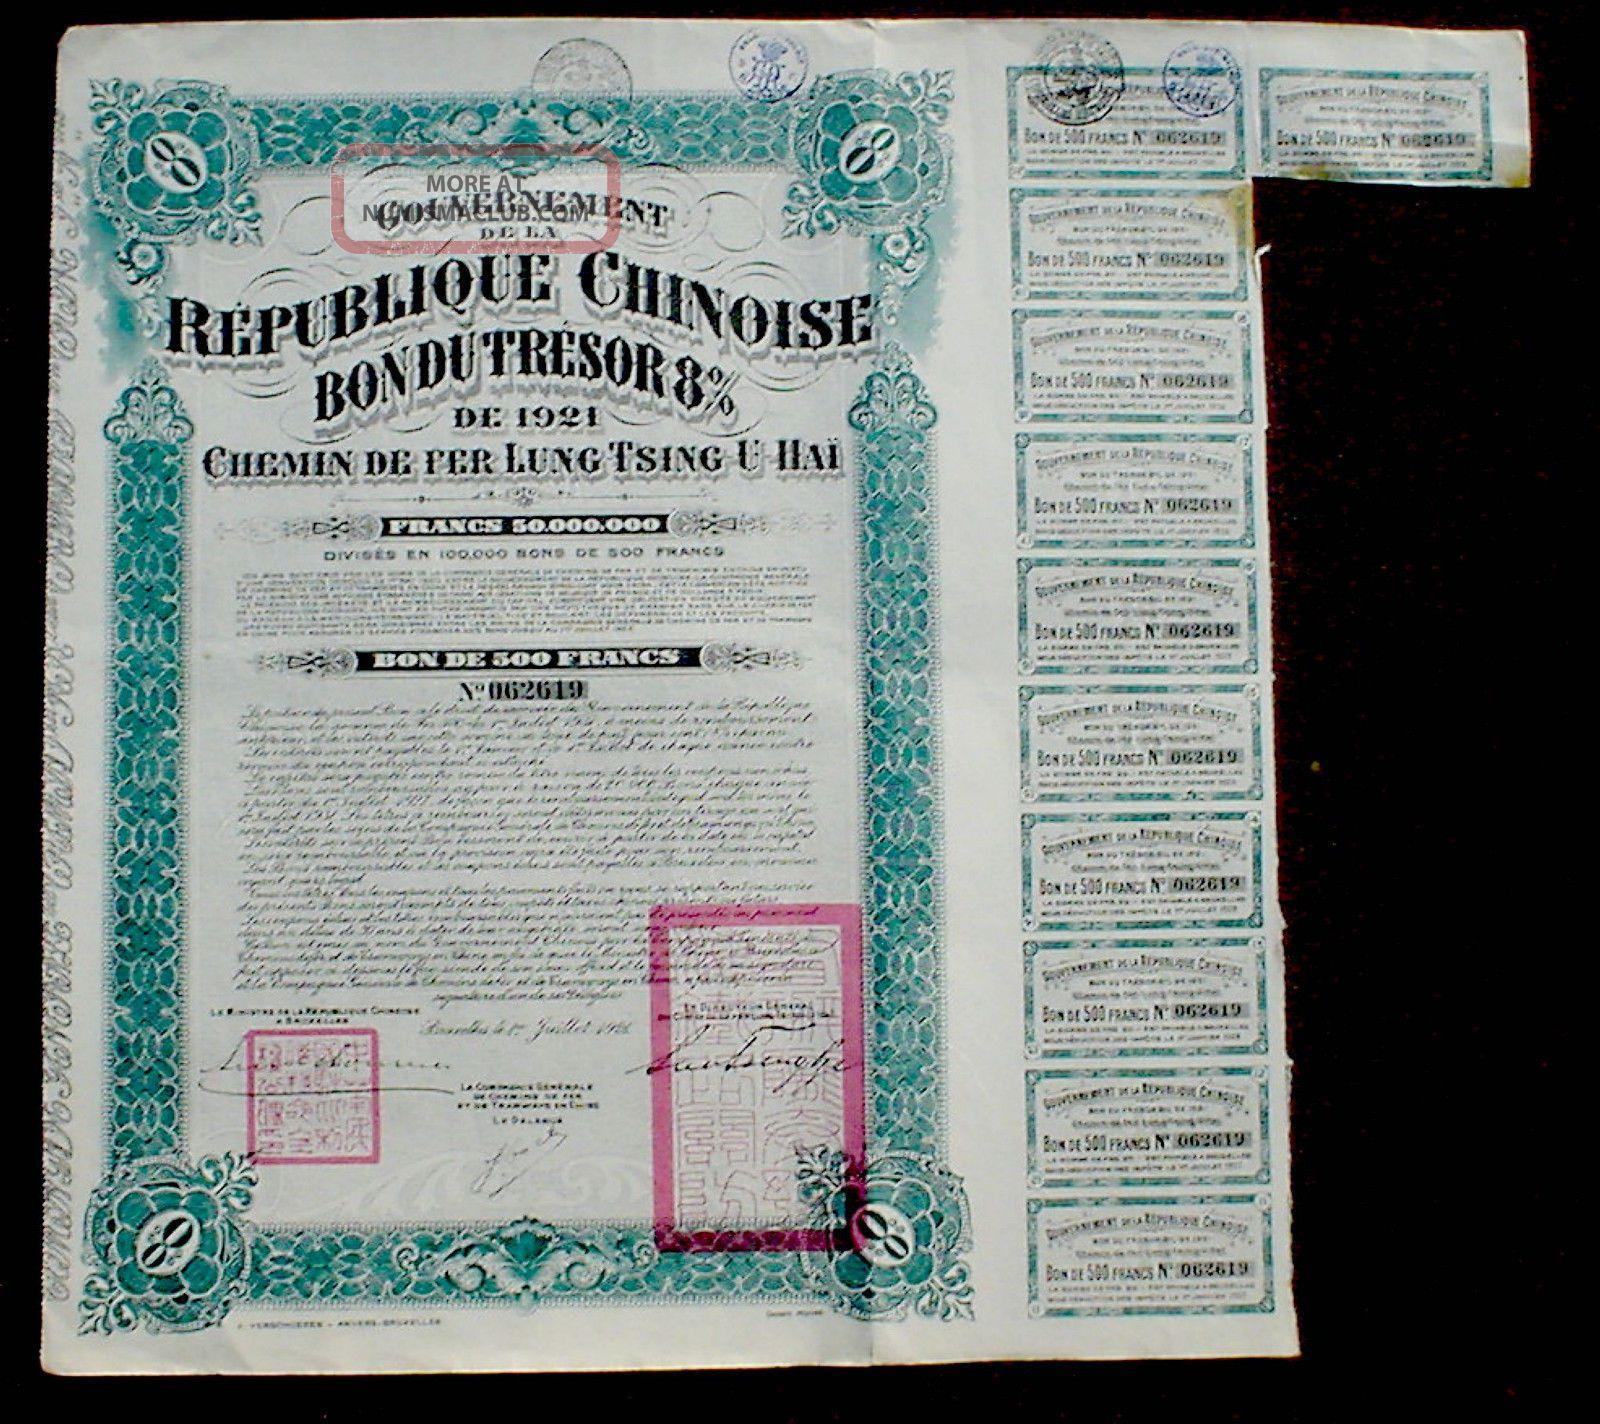 Chinese Government 8% Loan Bon Du Tresor 500 Francs 1921 Uncancelled + Coupons Stocks & Bonds, Scripophily photo